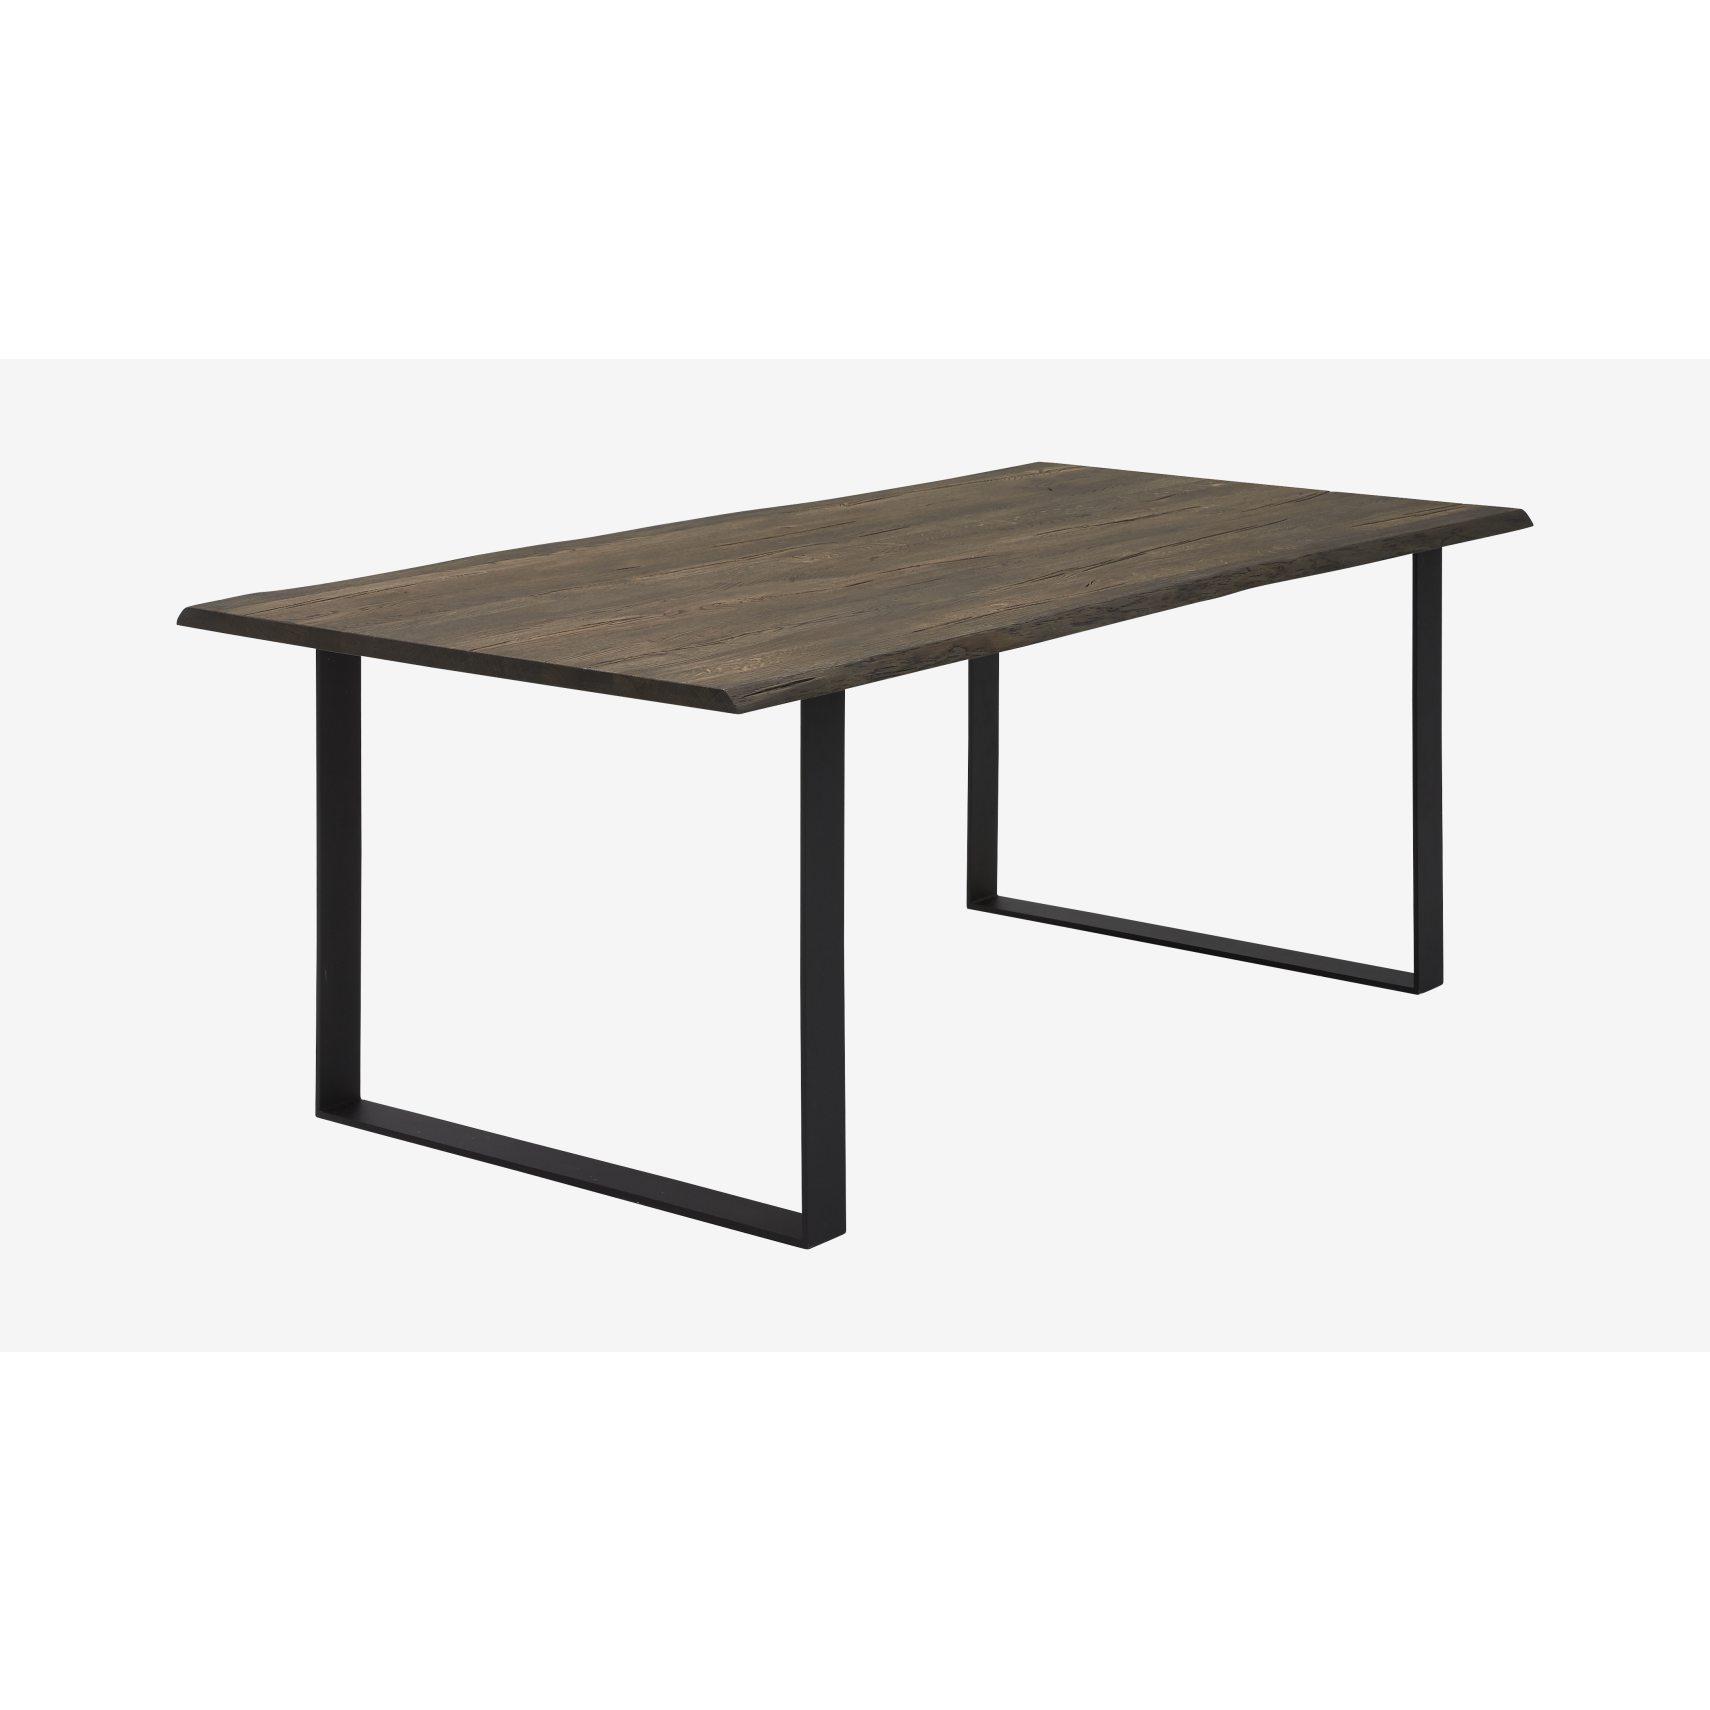 Timber 200 x 100 74 cm Spisebord